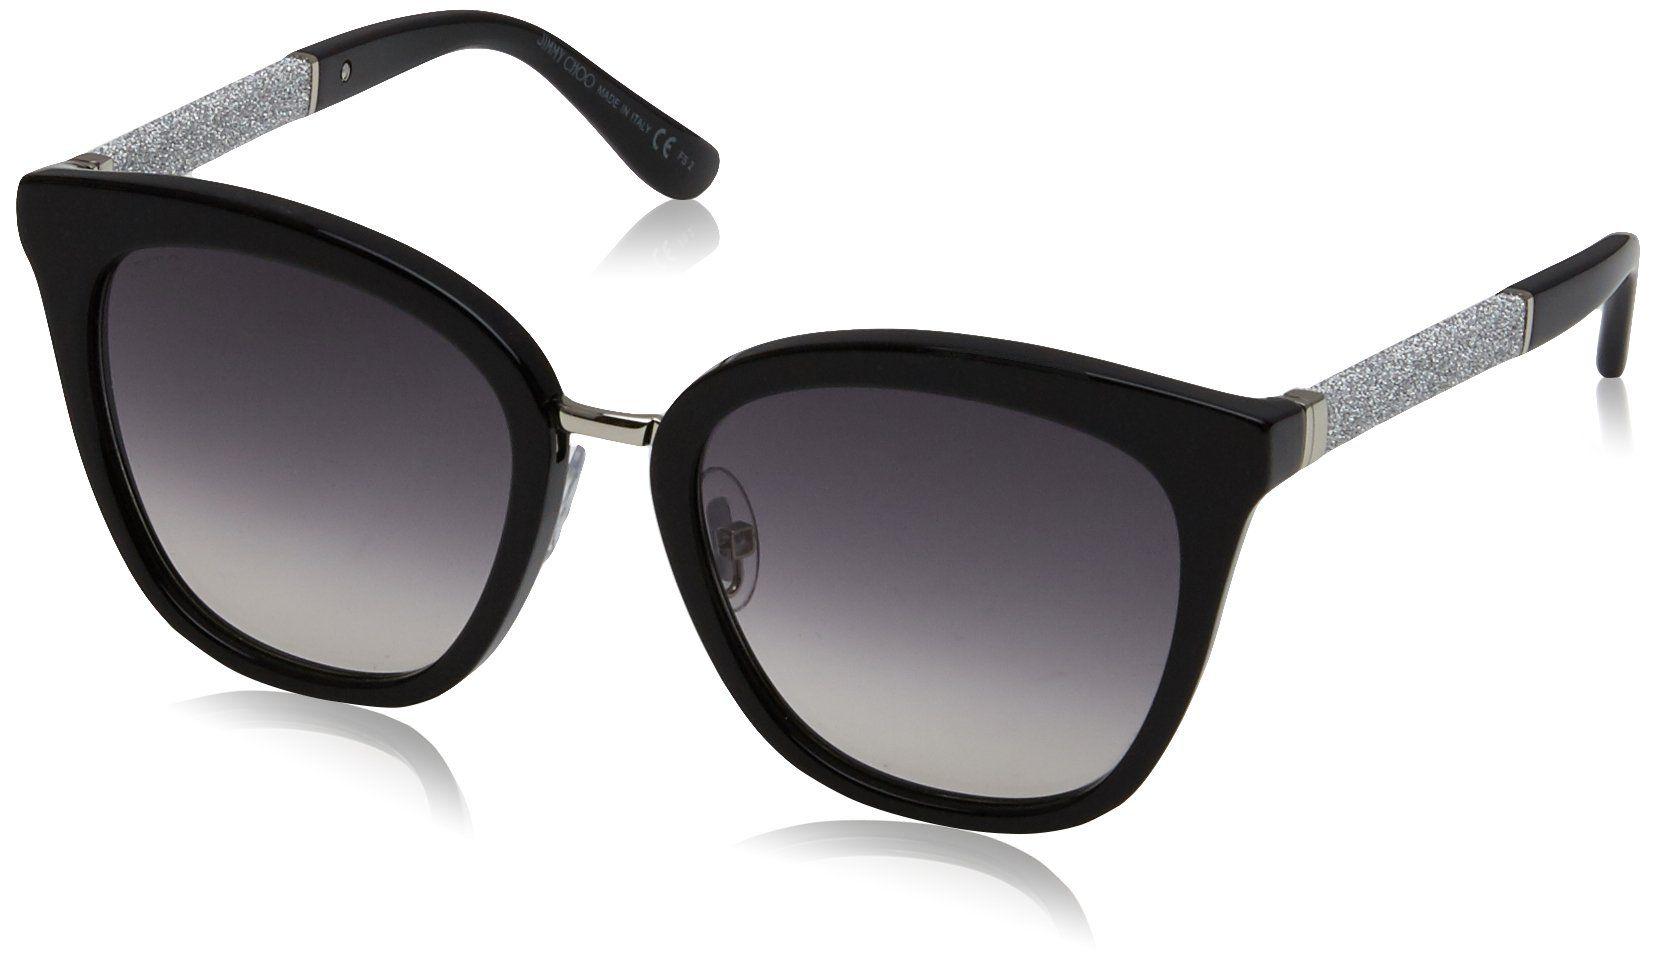 Jimmy Choo Fabry Sunglasses - Black & Glitter Black